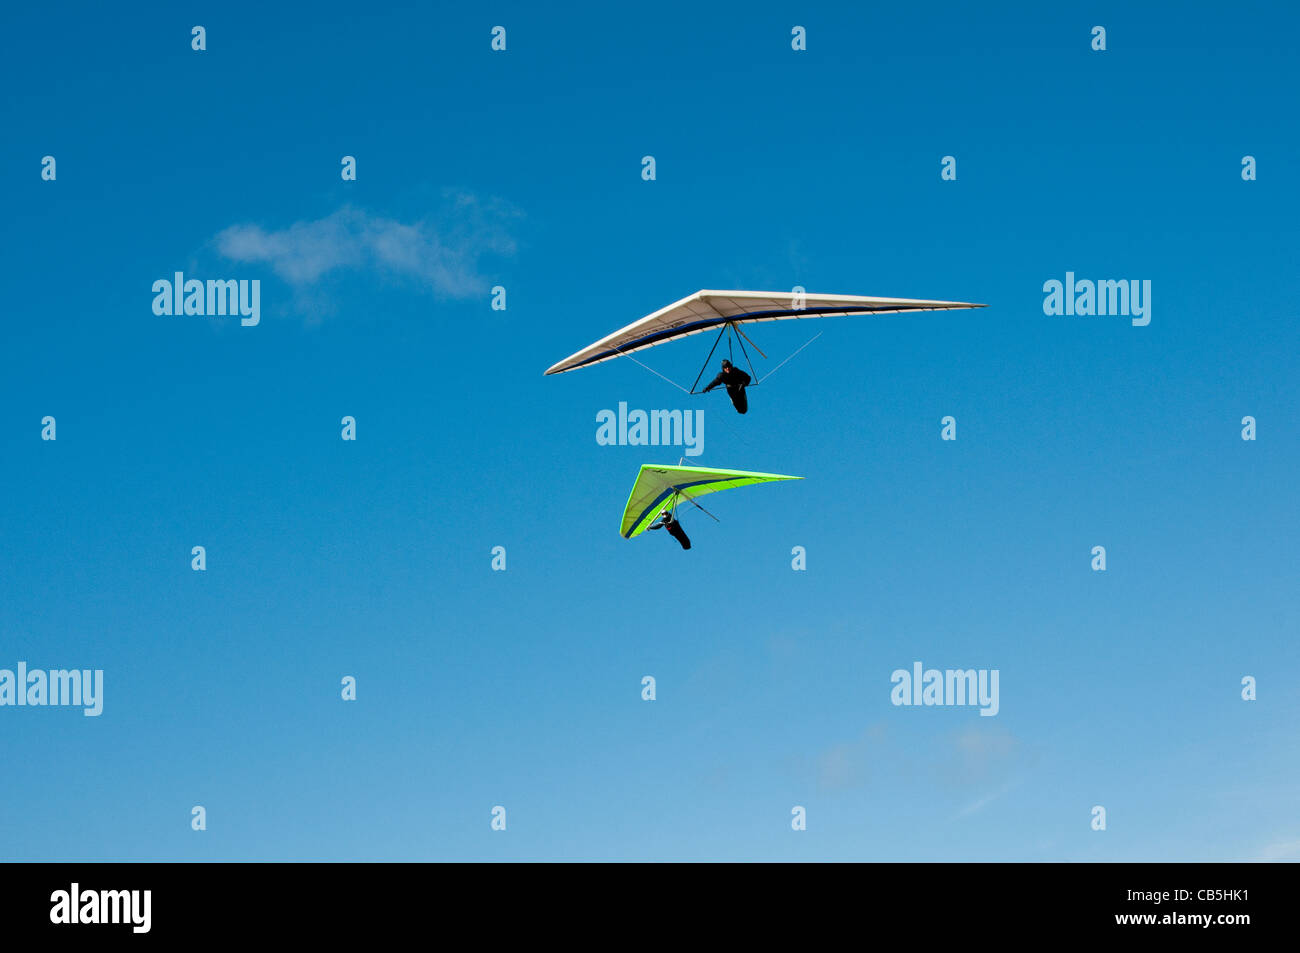 Hang gliding, hang glider, Fort Funston, San Francisco, California, USA. Photo copyright Lee Foster. Photo # california108447 - Stock Image